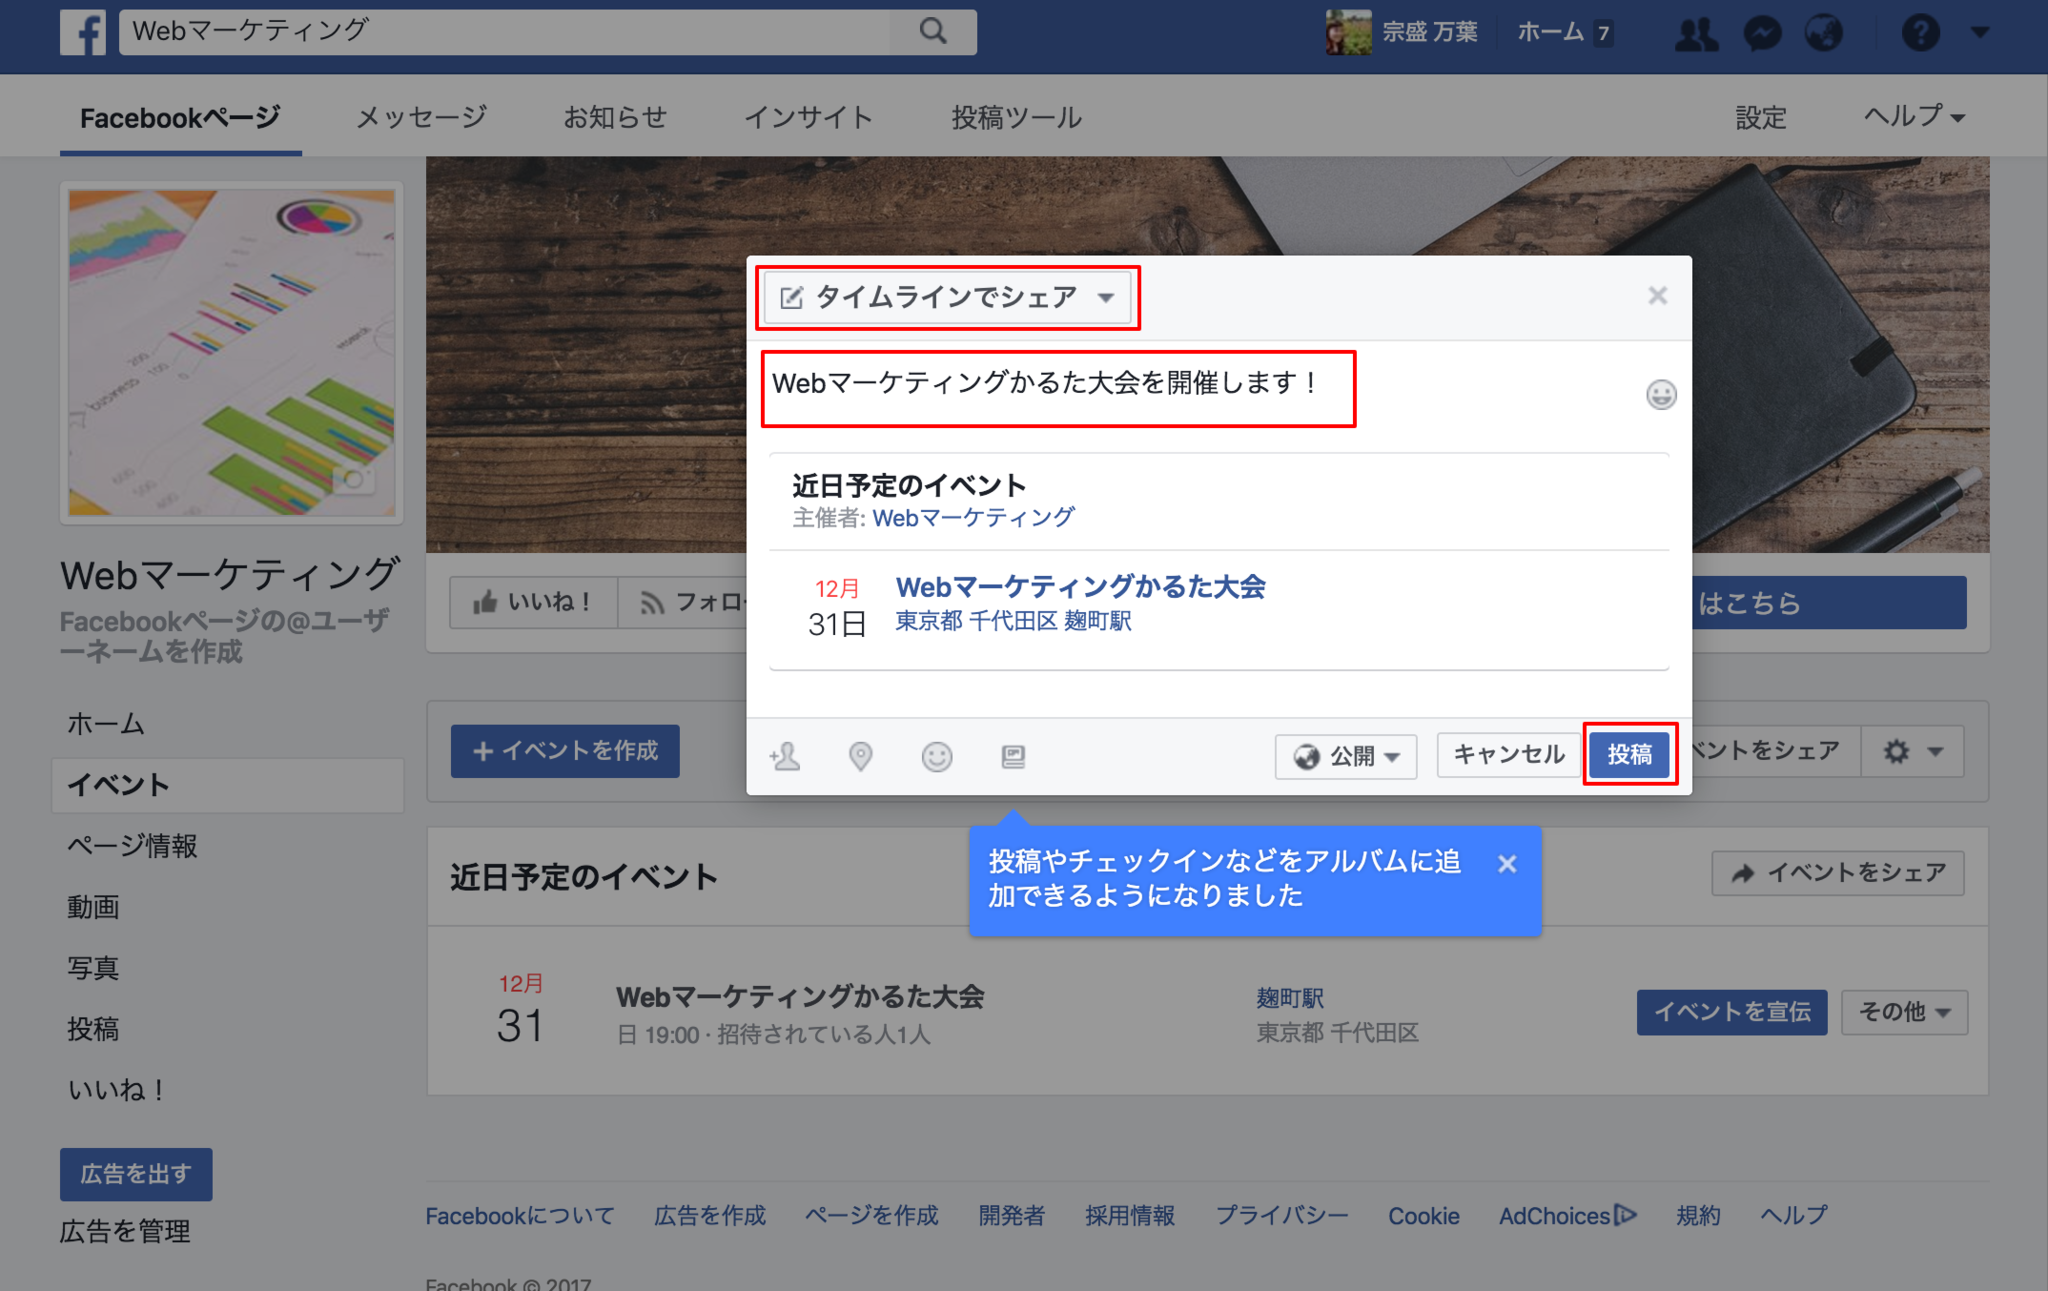 Webマーケティング___イベント_(5).png